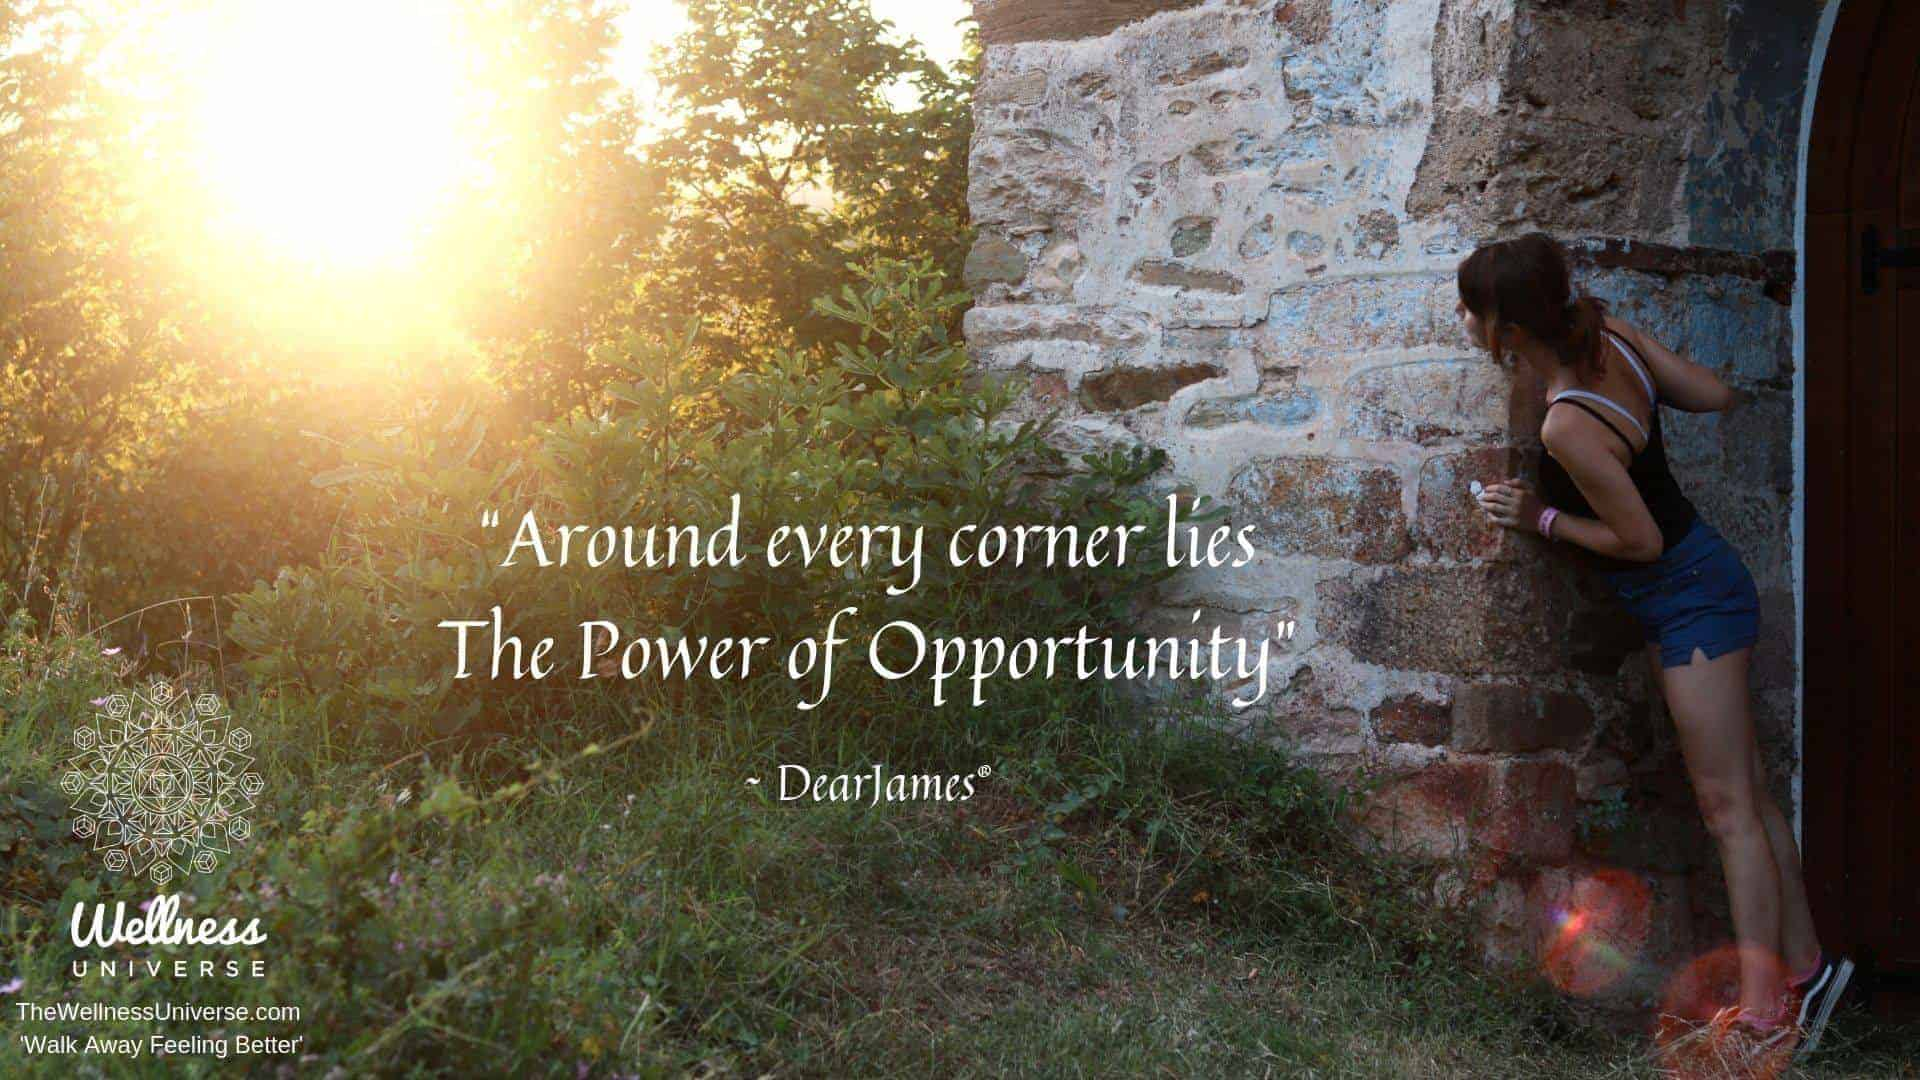 """Around every corner lies The Power of Opportunity"" ~ @dearjames ® #Opportunity #WUVIP #WUWorld"